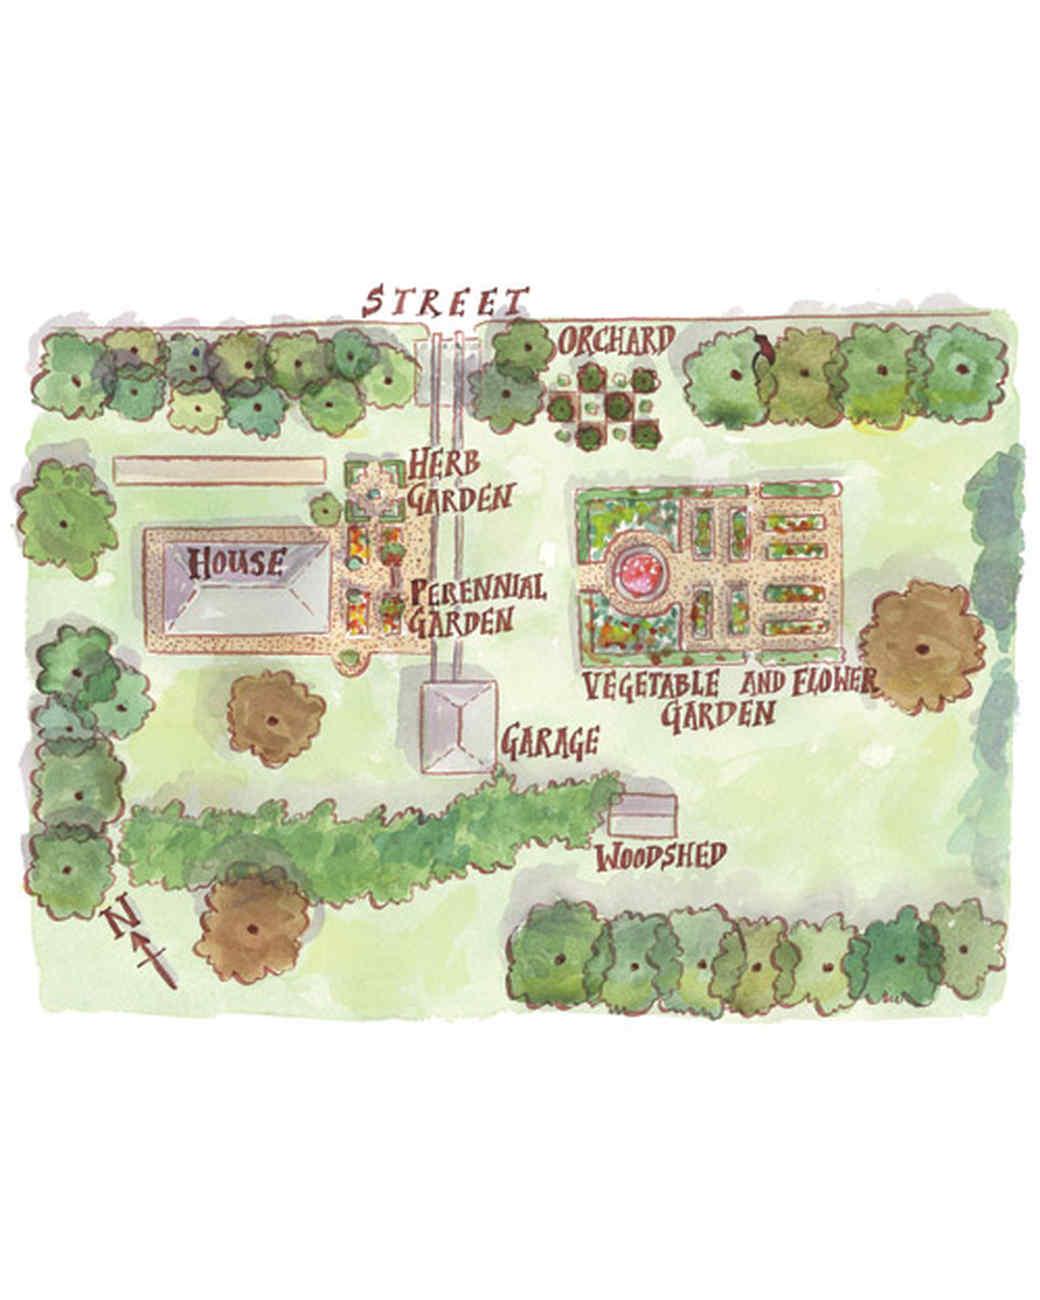 ld104976_0809_griff_garden_map.jpg